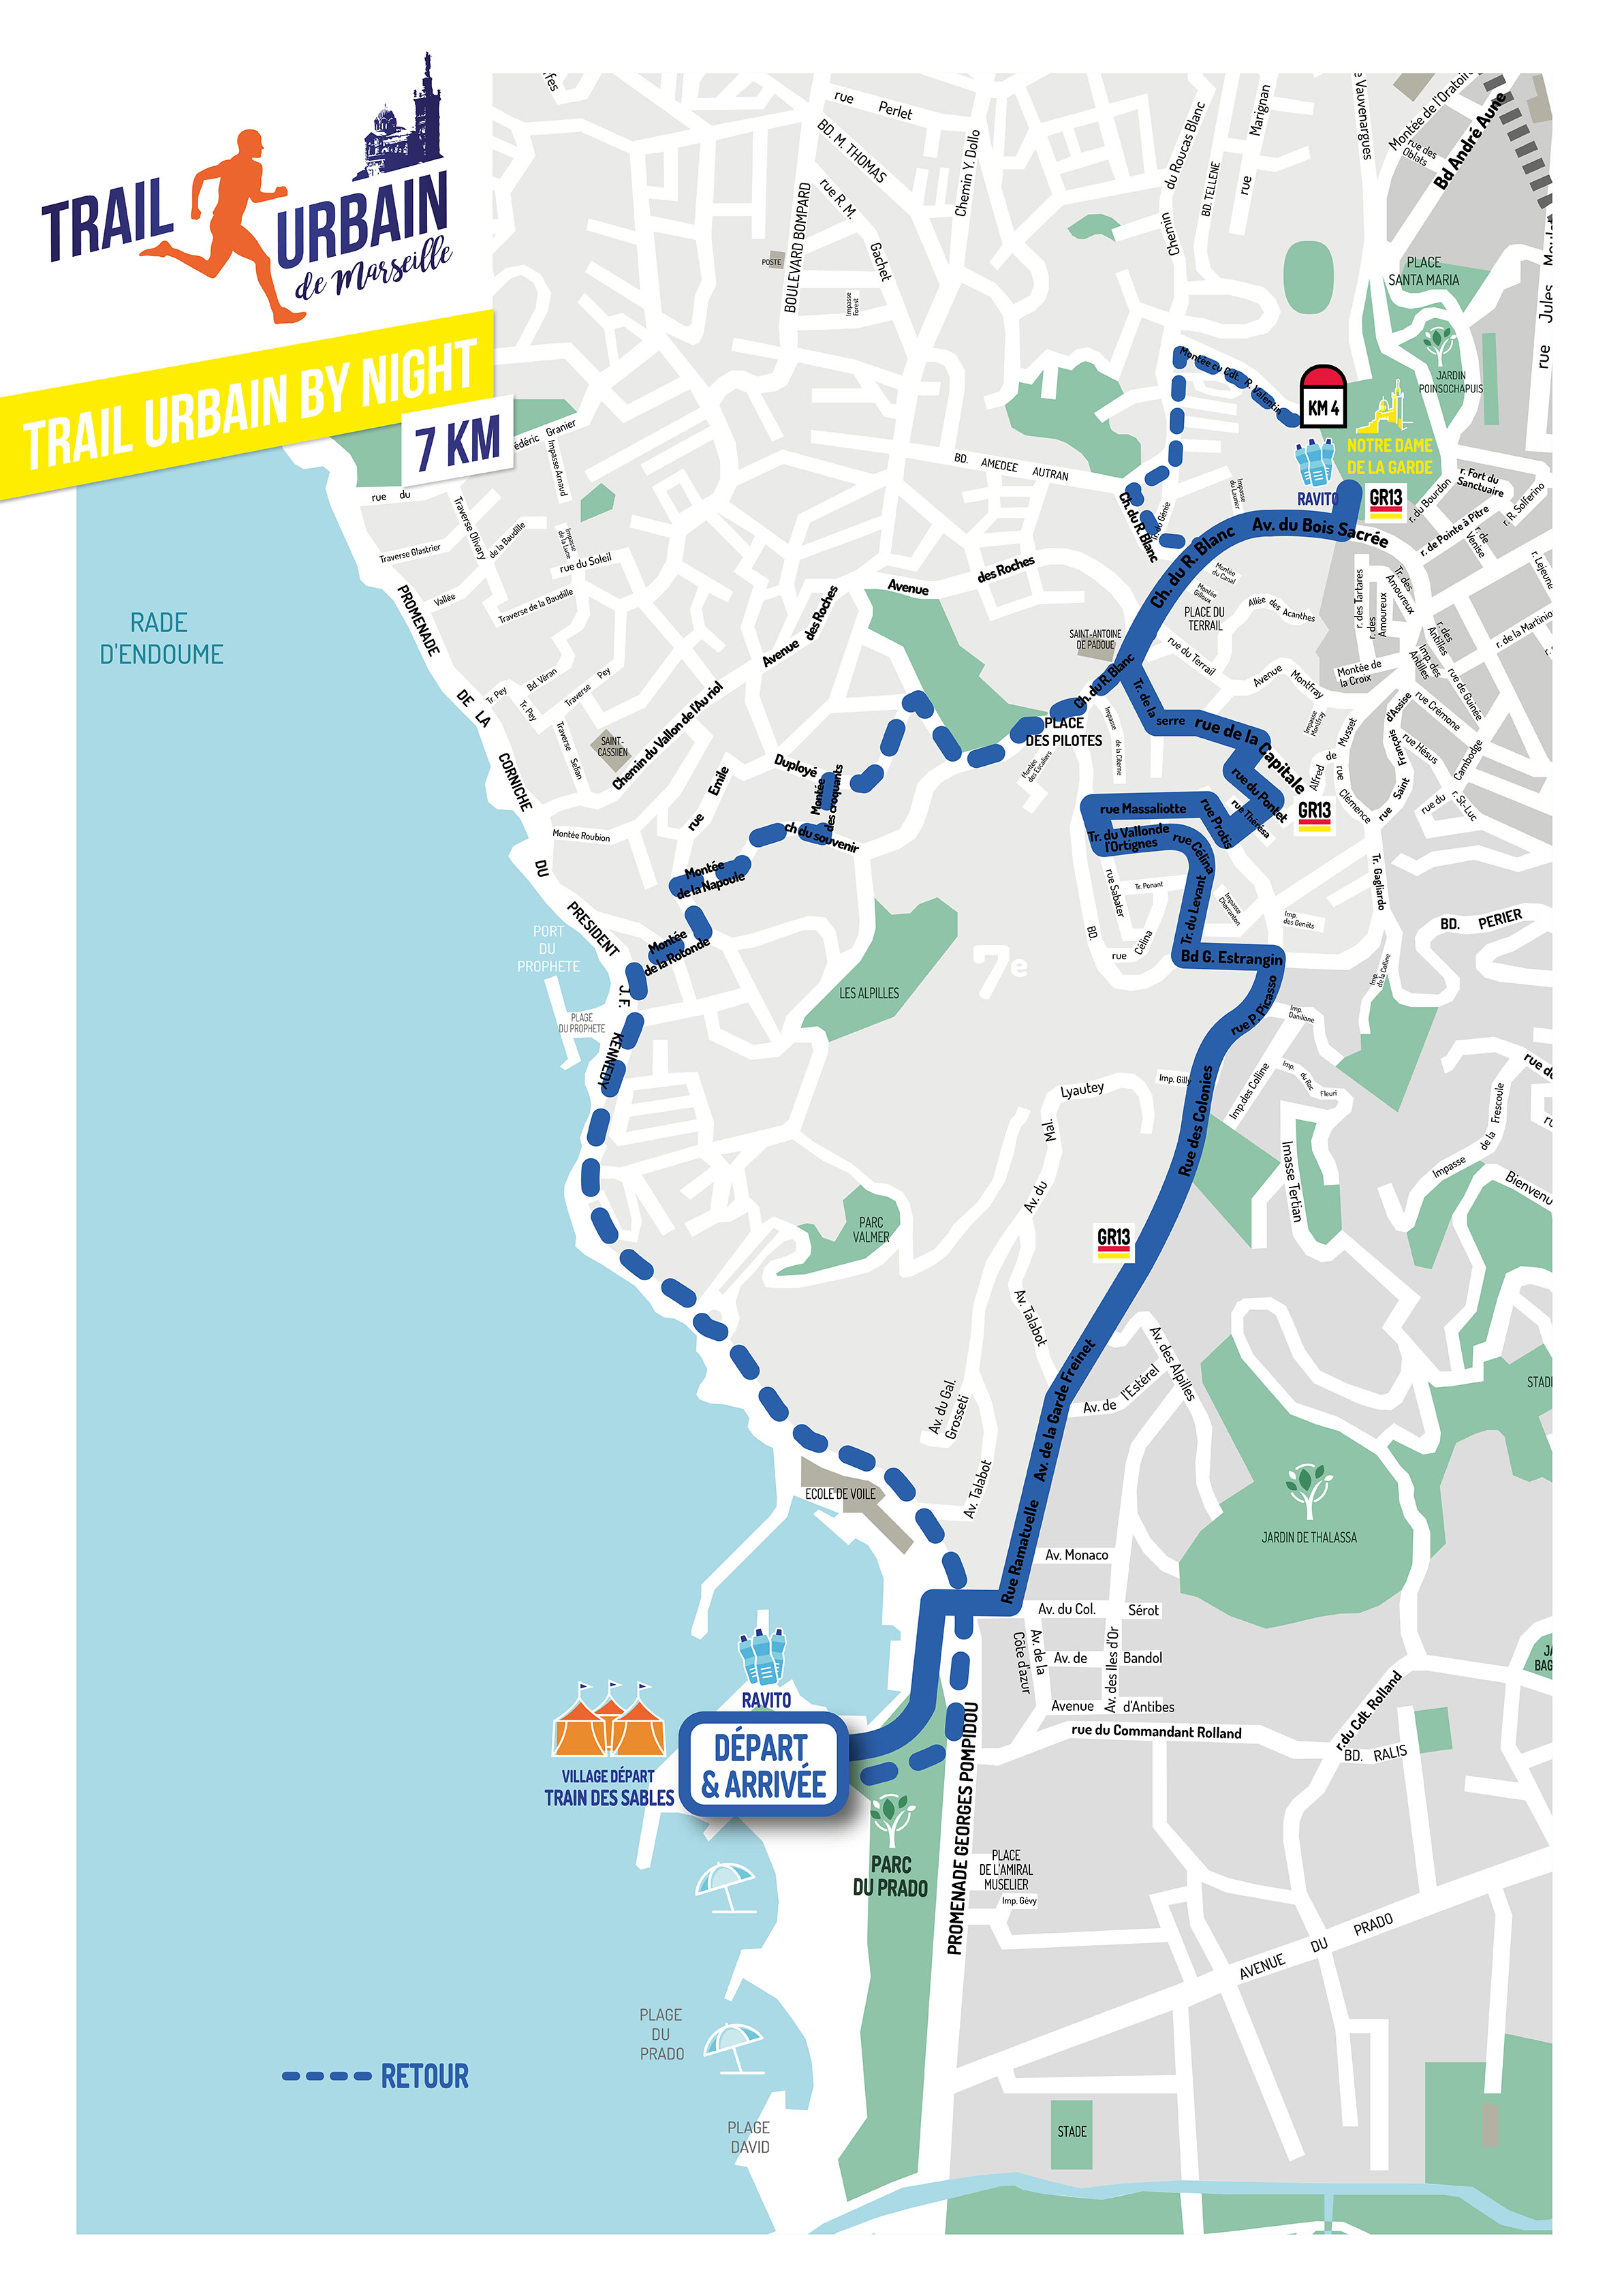 parcours trail by night, Trail urbain de Marseille 2018, courir à Marseille